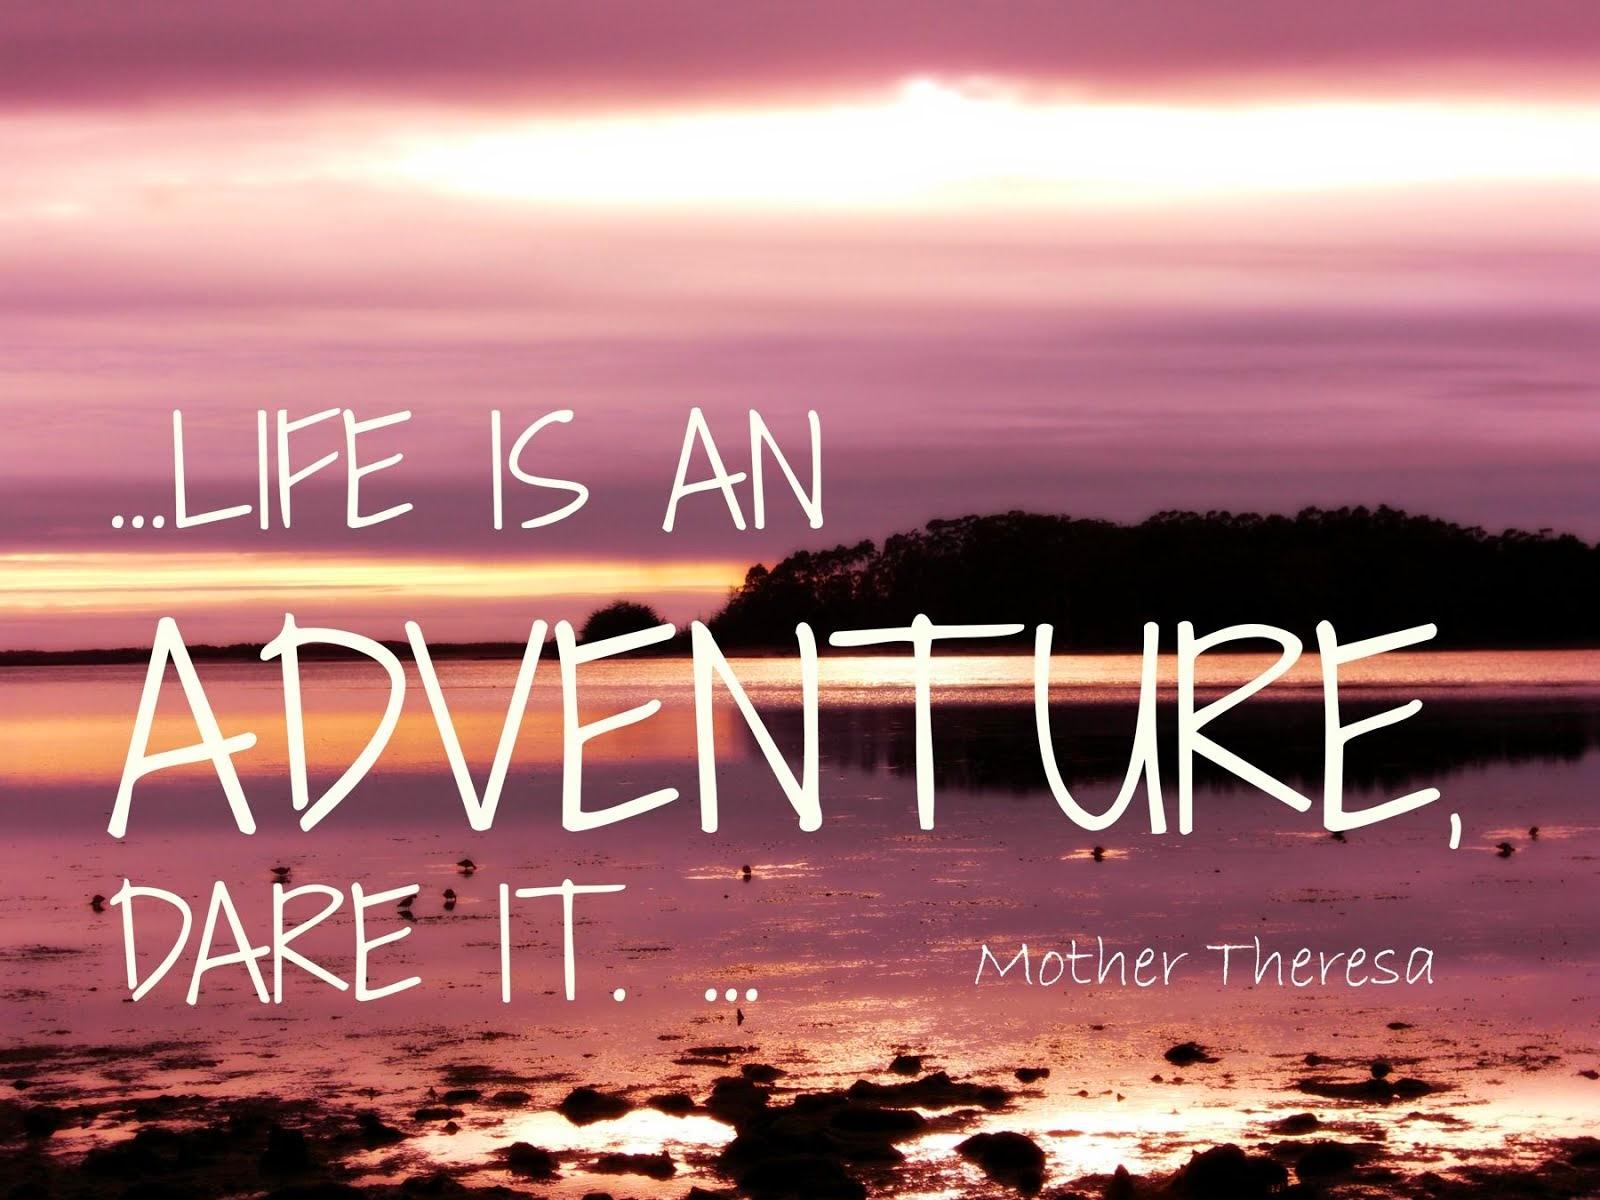 Cruise Vacation Quotes Quotesgram: Home Travel Quotes. QuotesGram